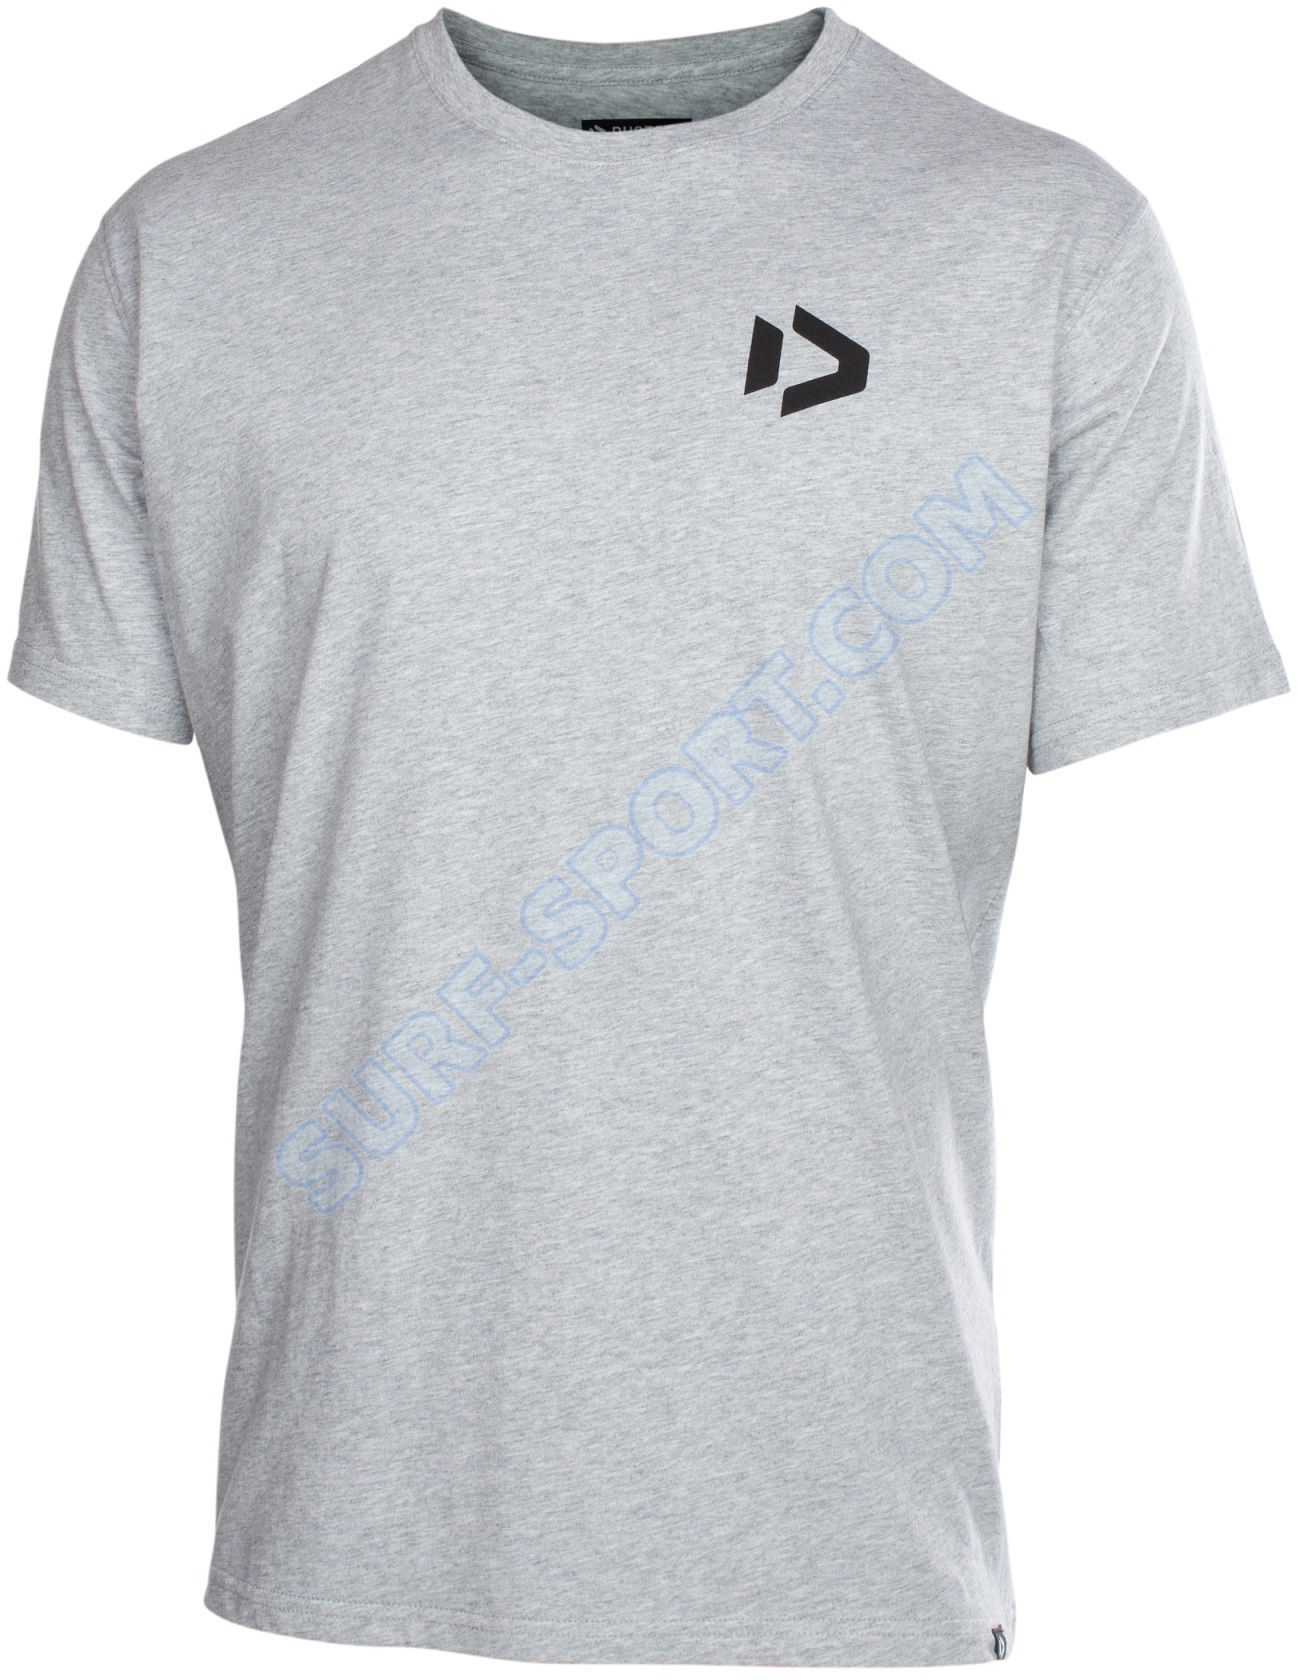 Koszulka Duotone Tee SS Logo 2019 Gray Melange